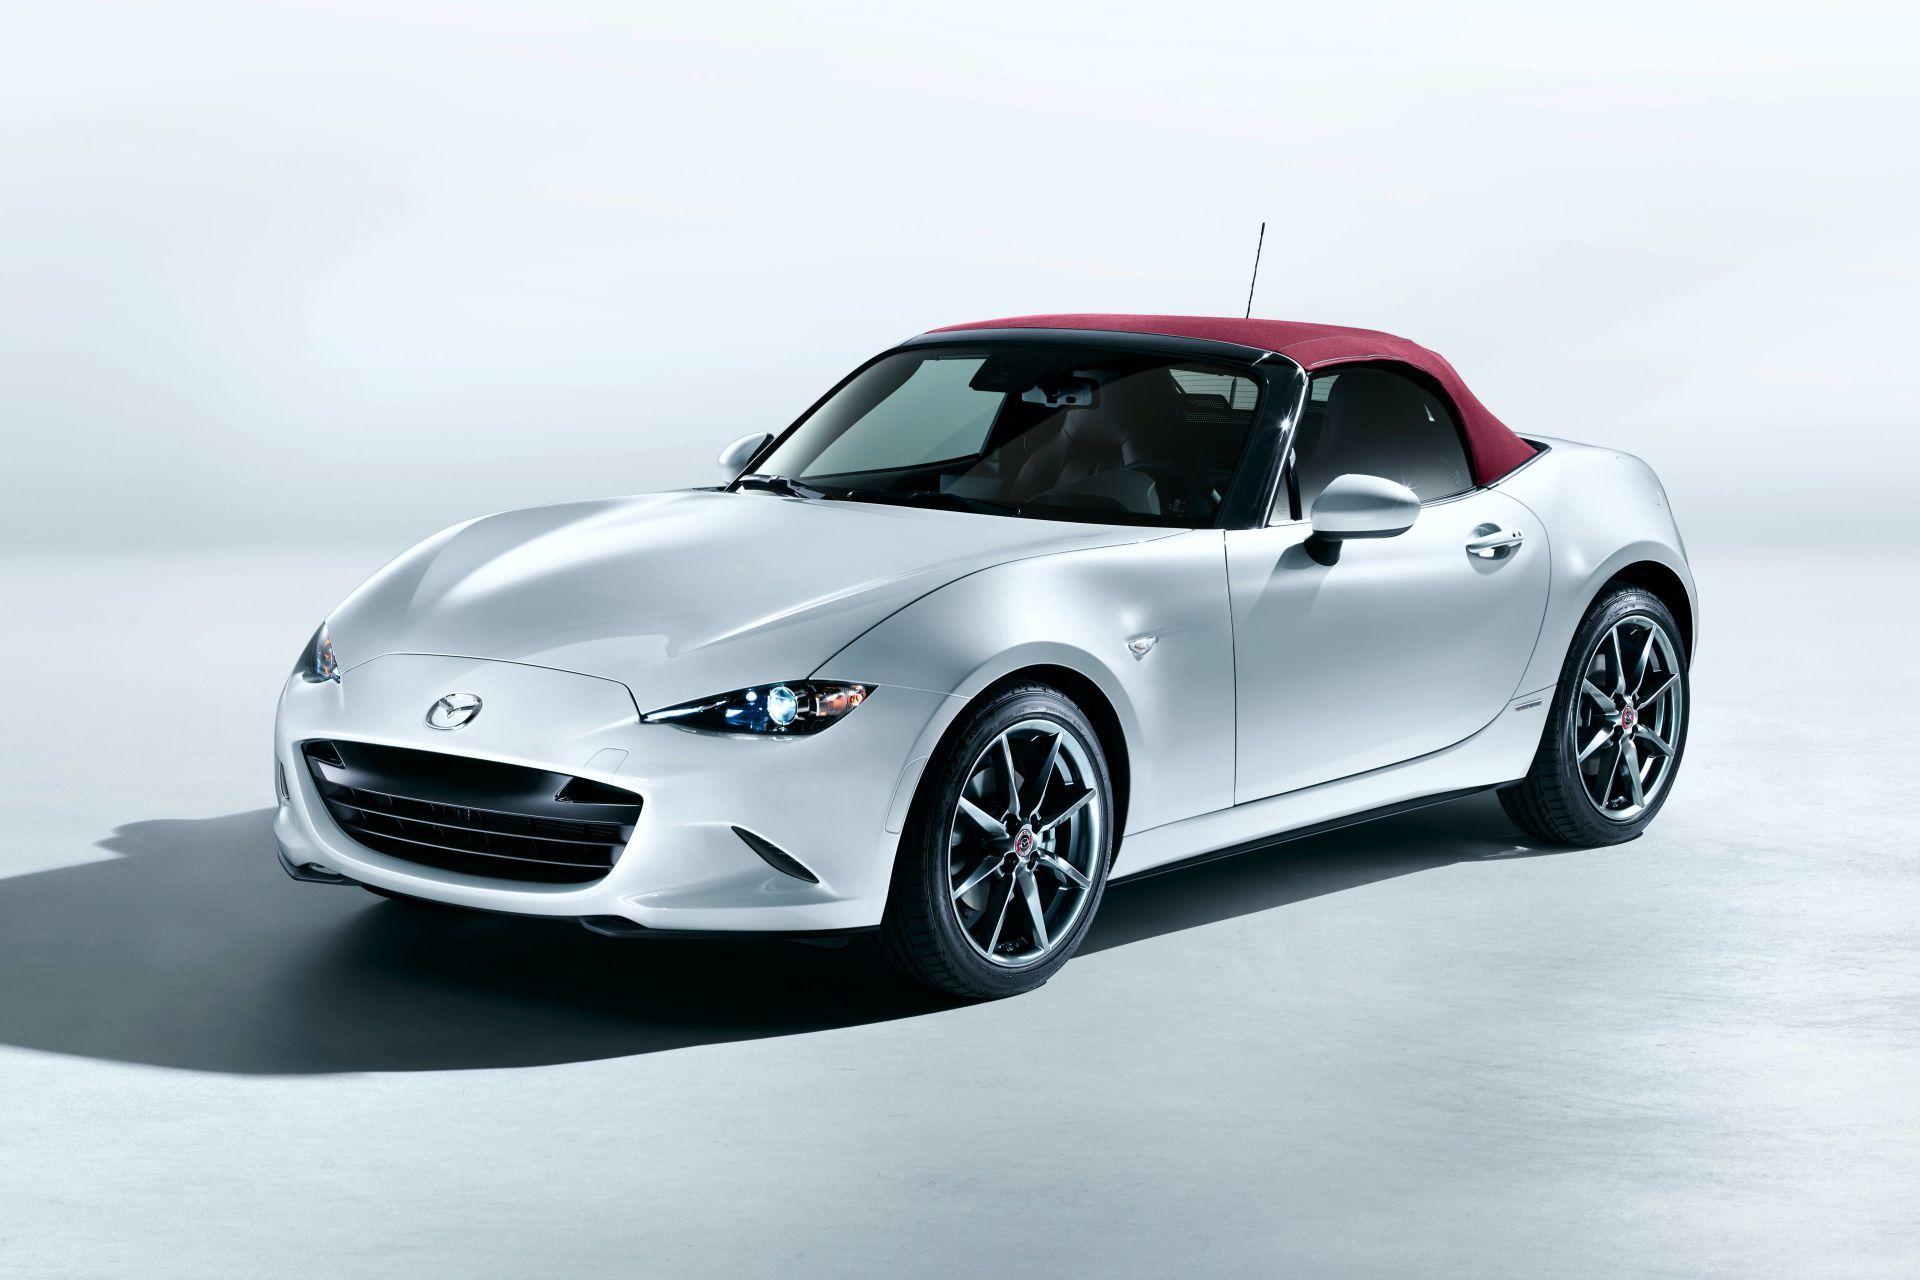 2021 Mazda Miata New Model and Performance